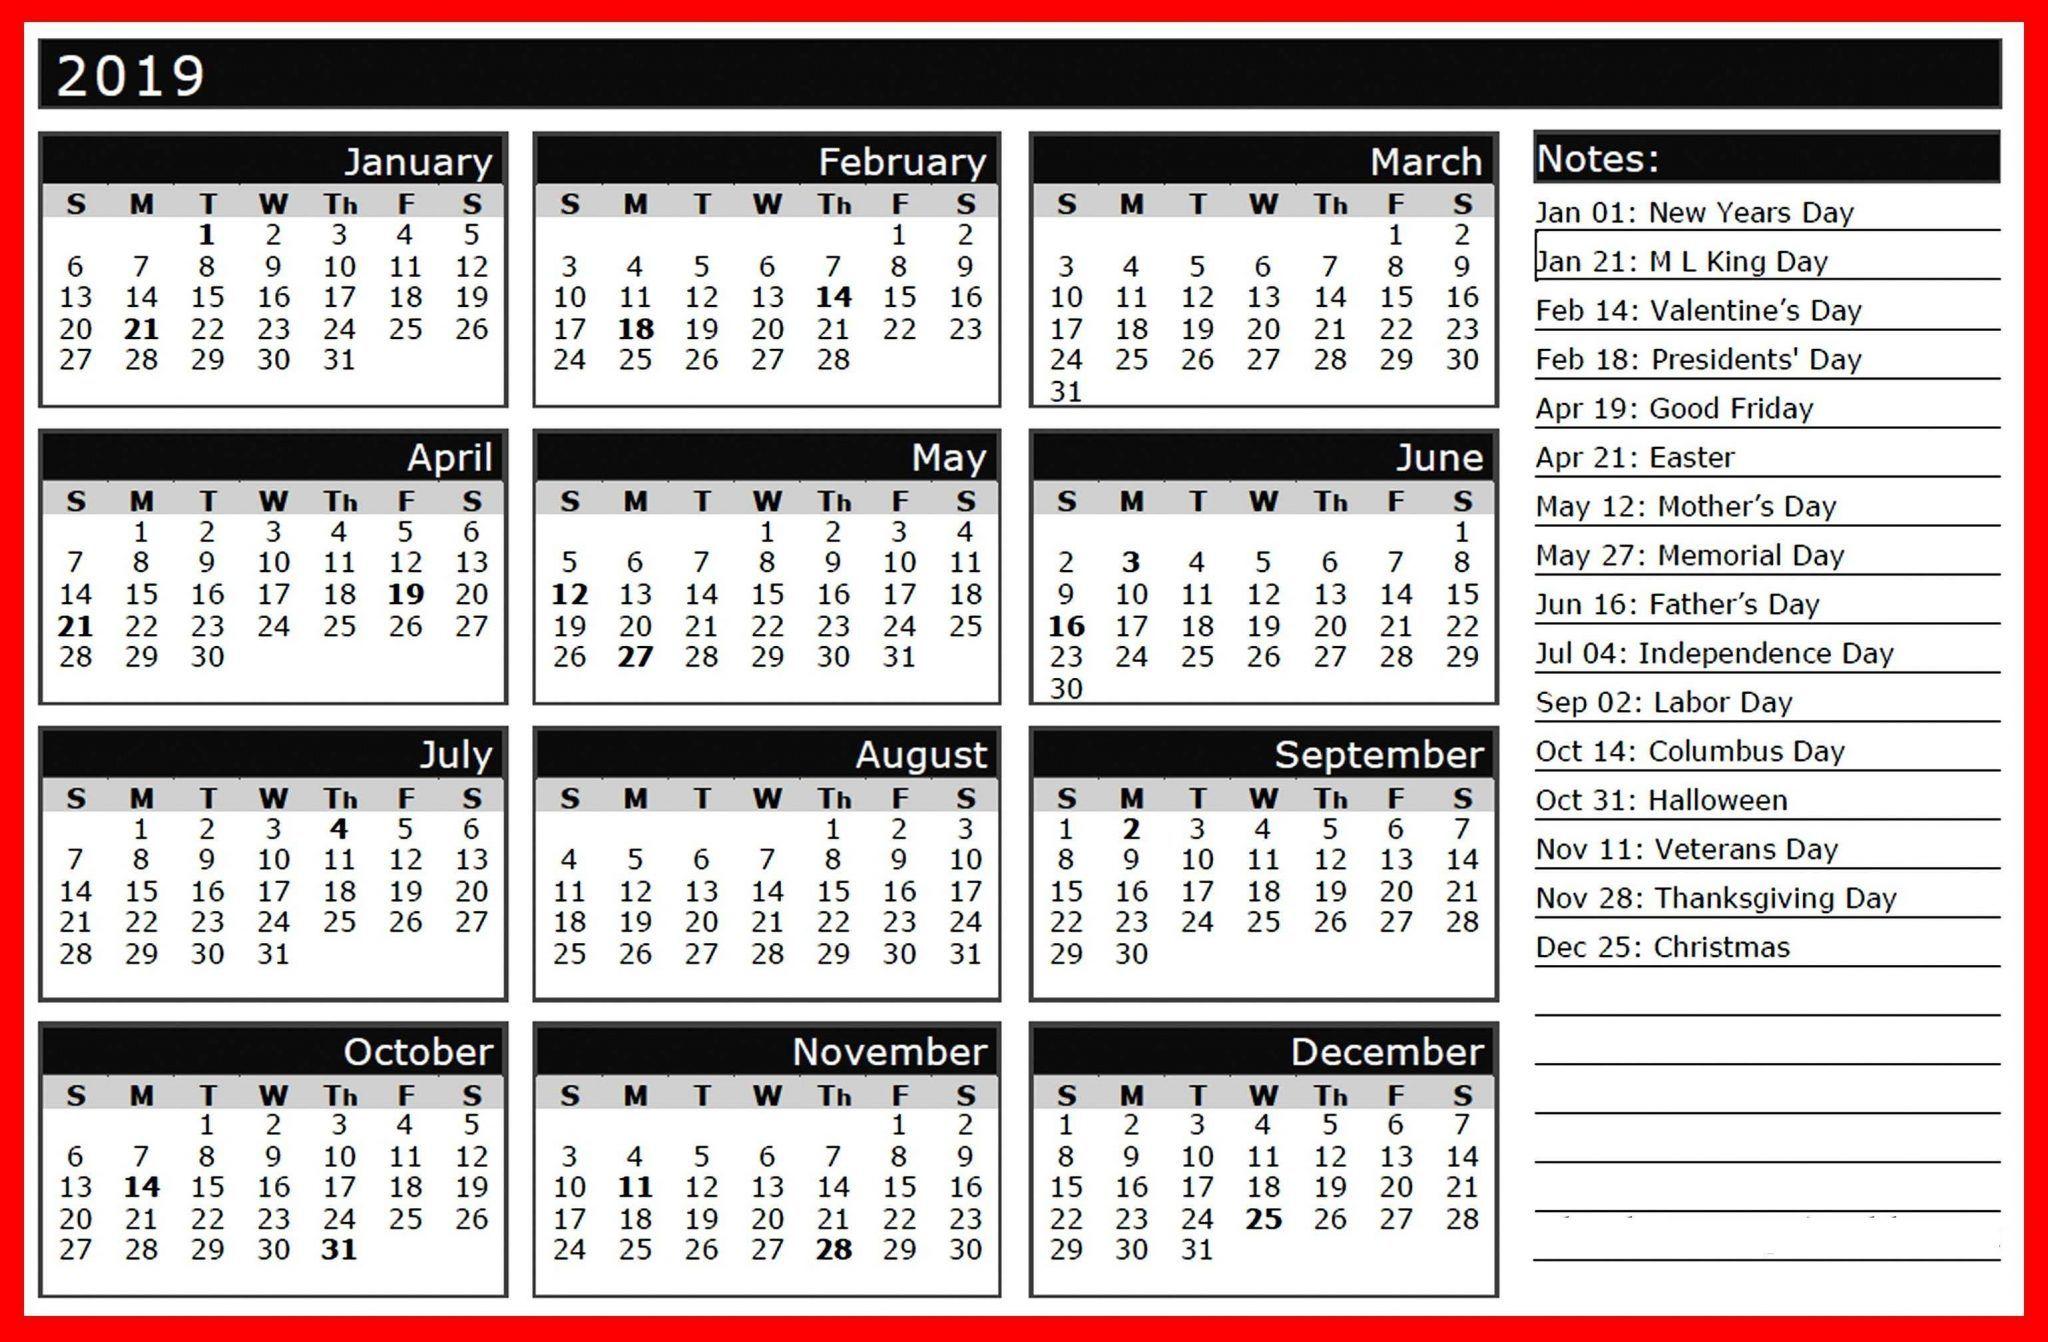 2019 Holiday Calendar India Printable calendar template